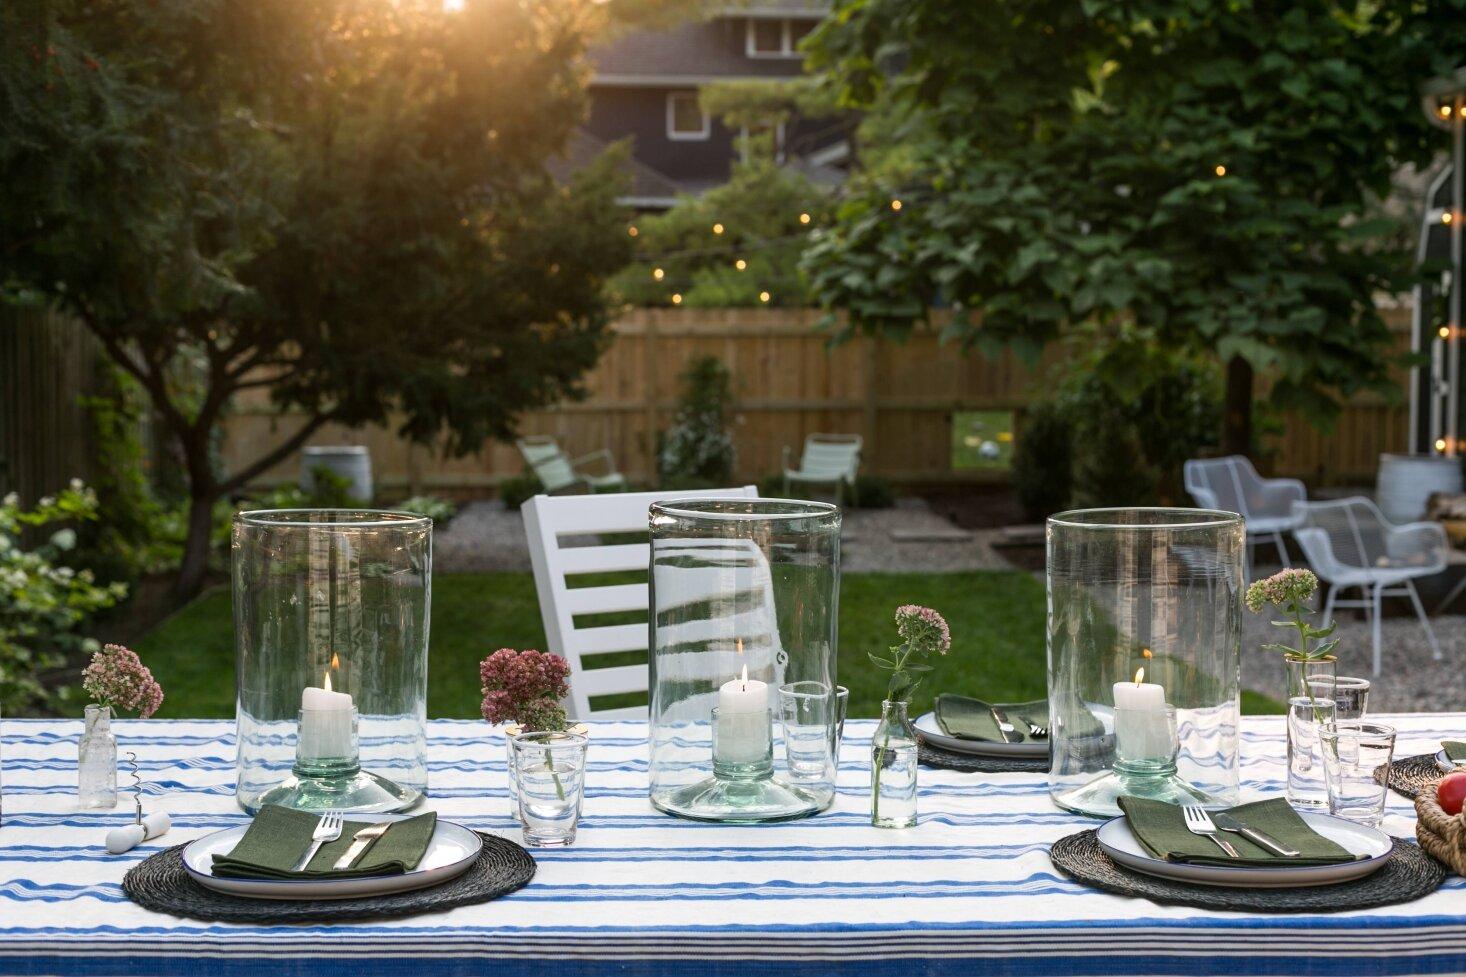 outdoor-dining-patio-michelle-adams-ann-arbor-michigan-by-marta-xochilt-perez-1466x977.jpg